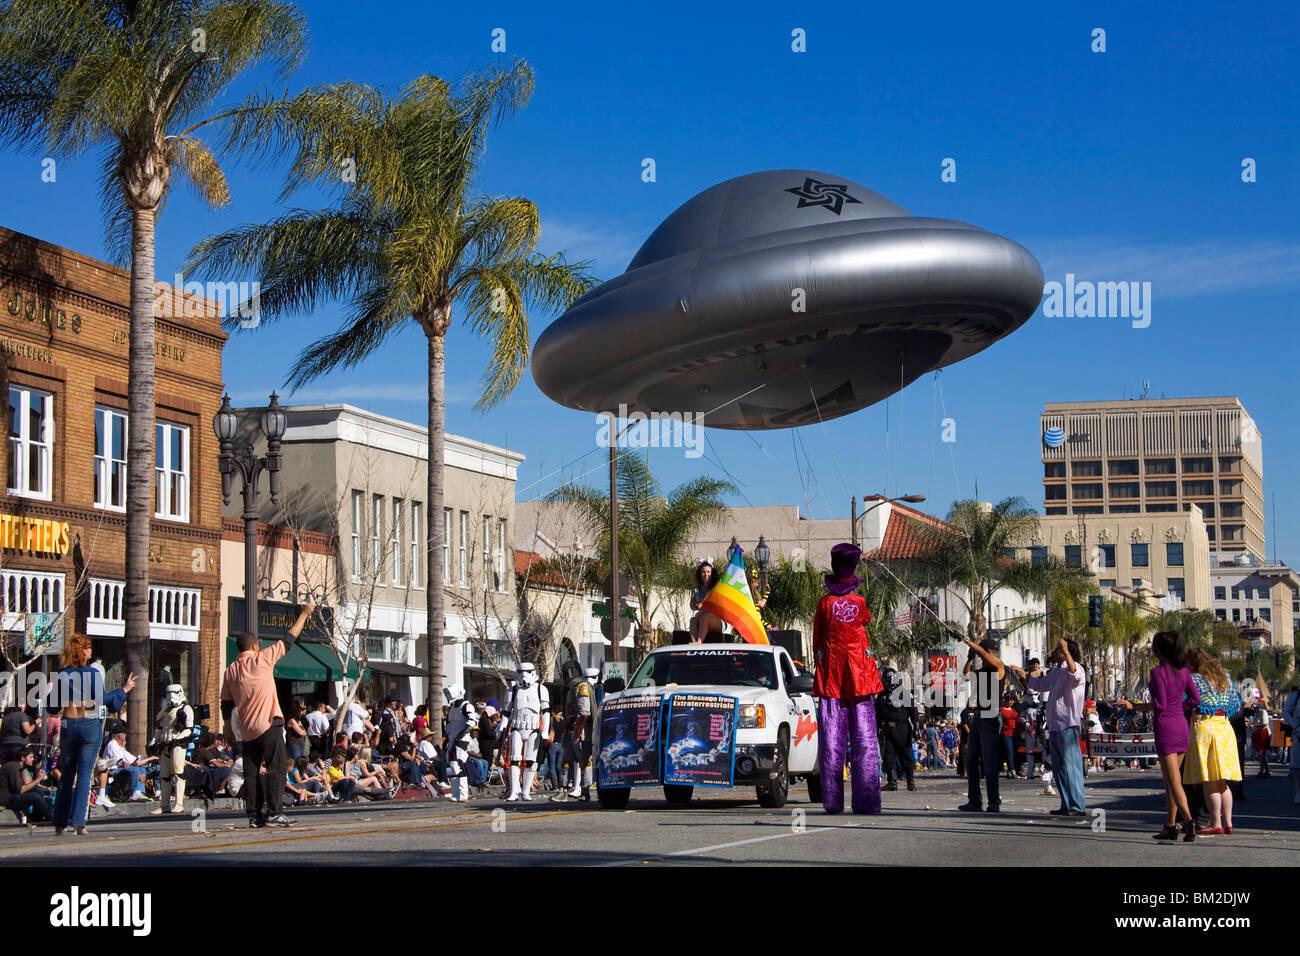 Spaceship, Doo Dah Parade, Pasadena, Los Angeles, California, USA - Stock Image